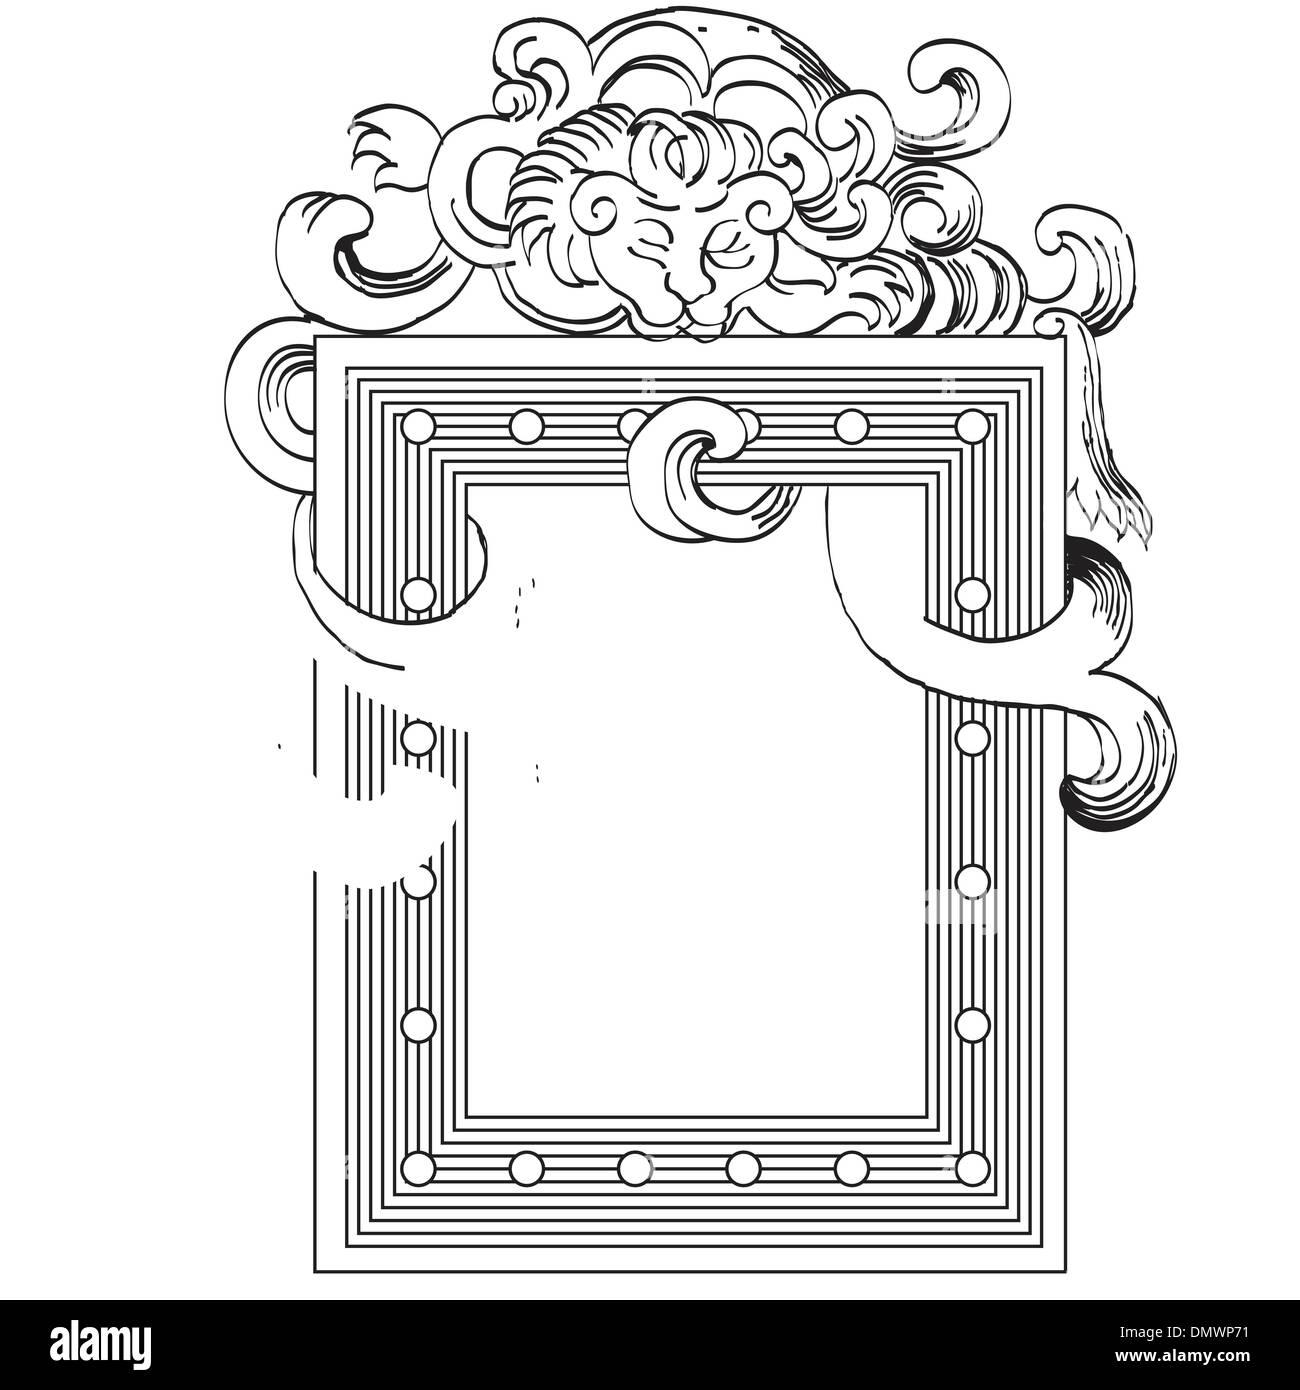 Photo Engraving Stockfotos & Photo Engraving Bilder - Alamy